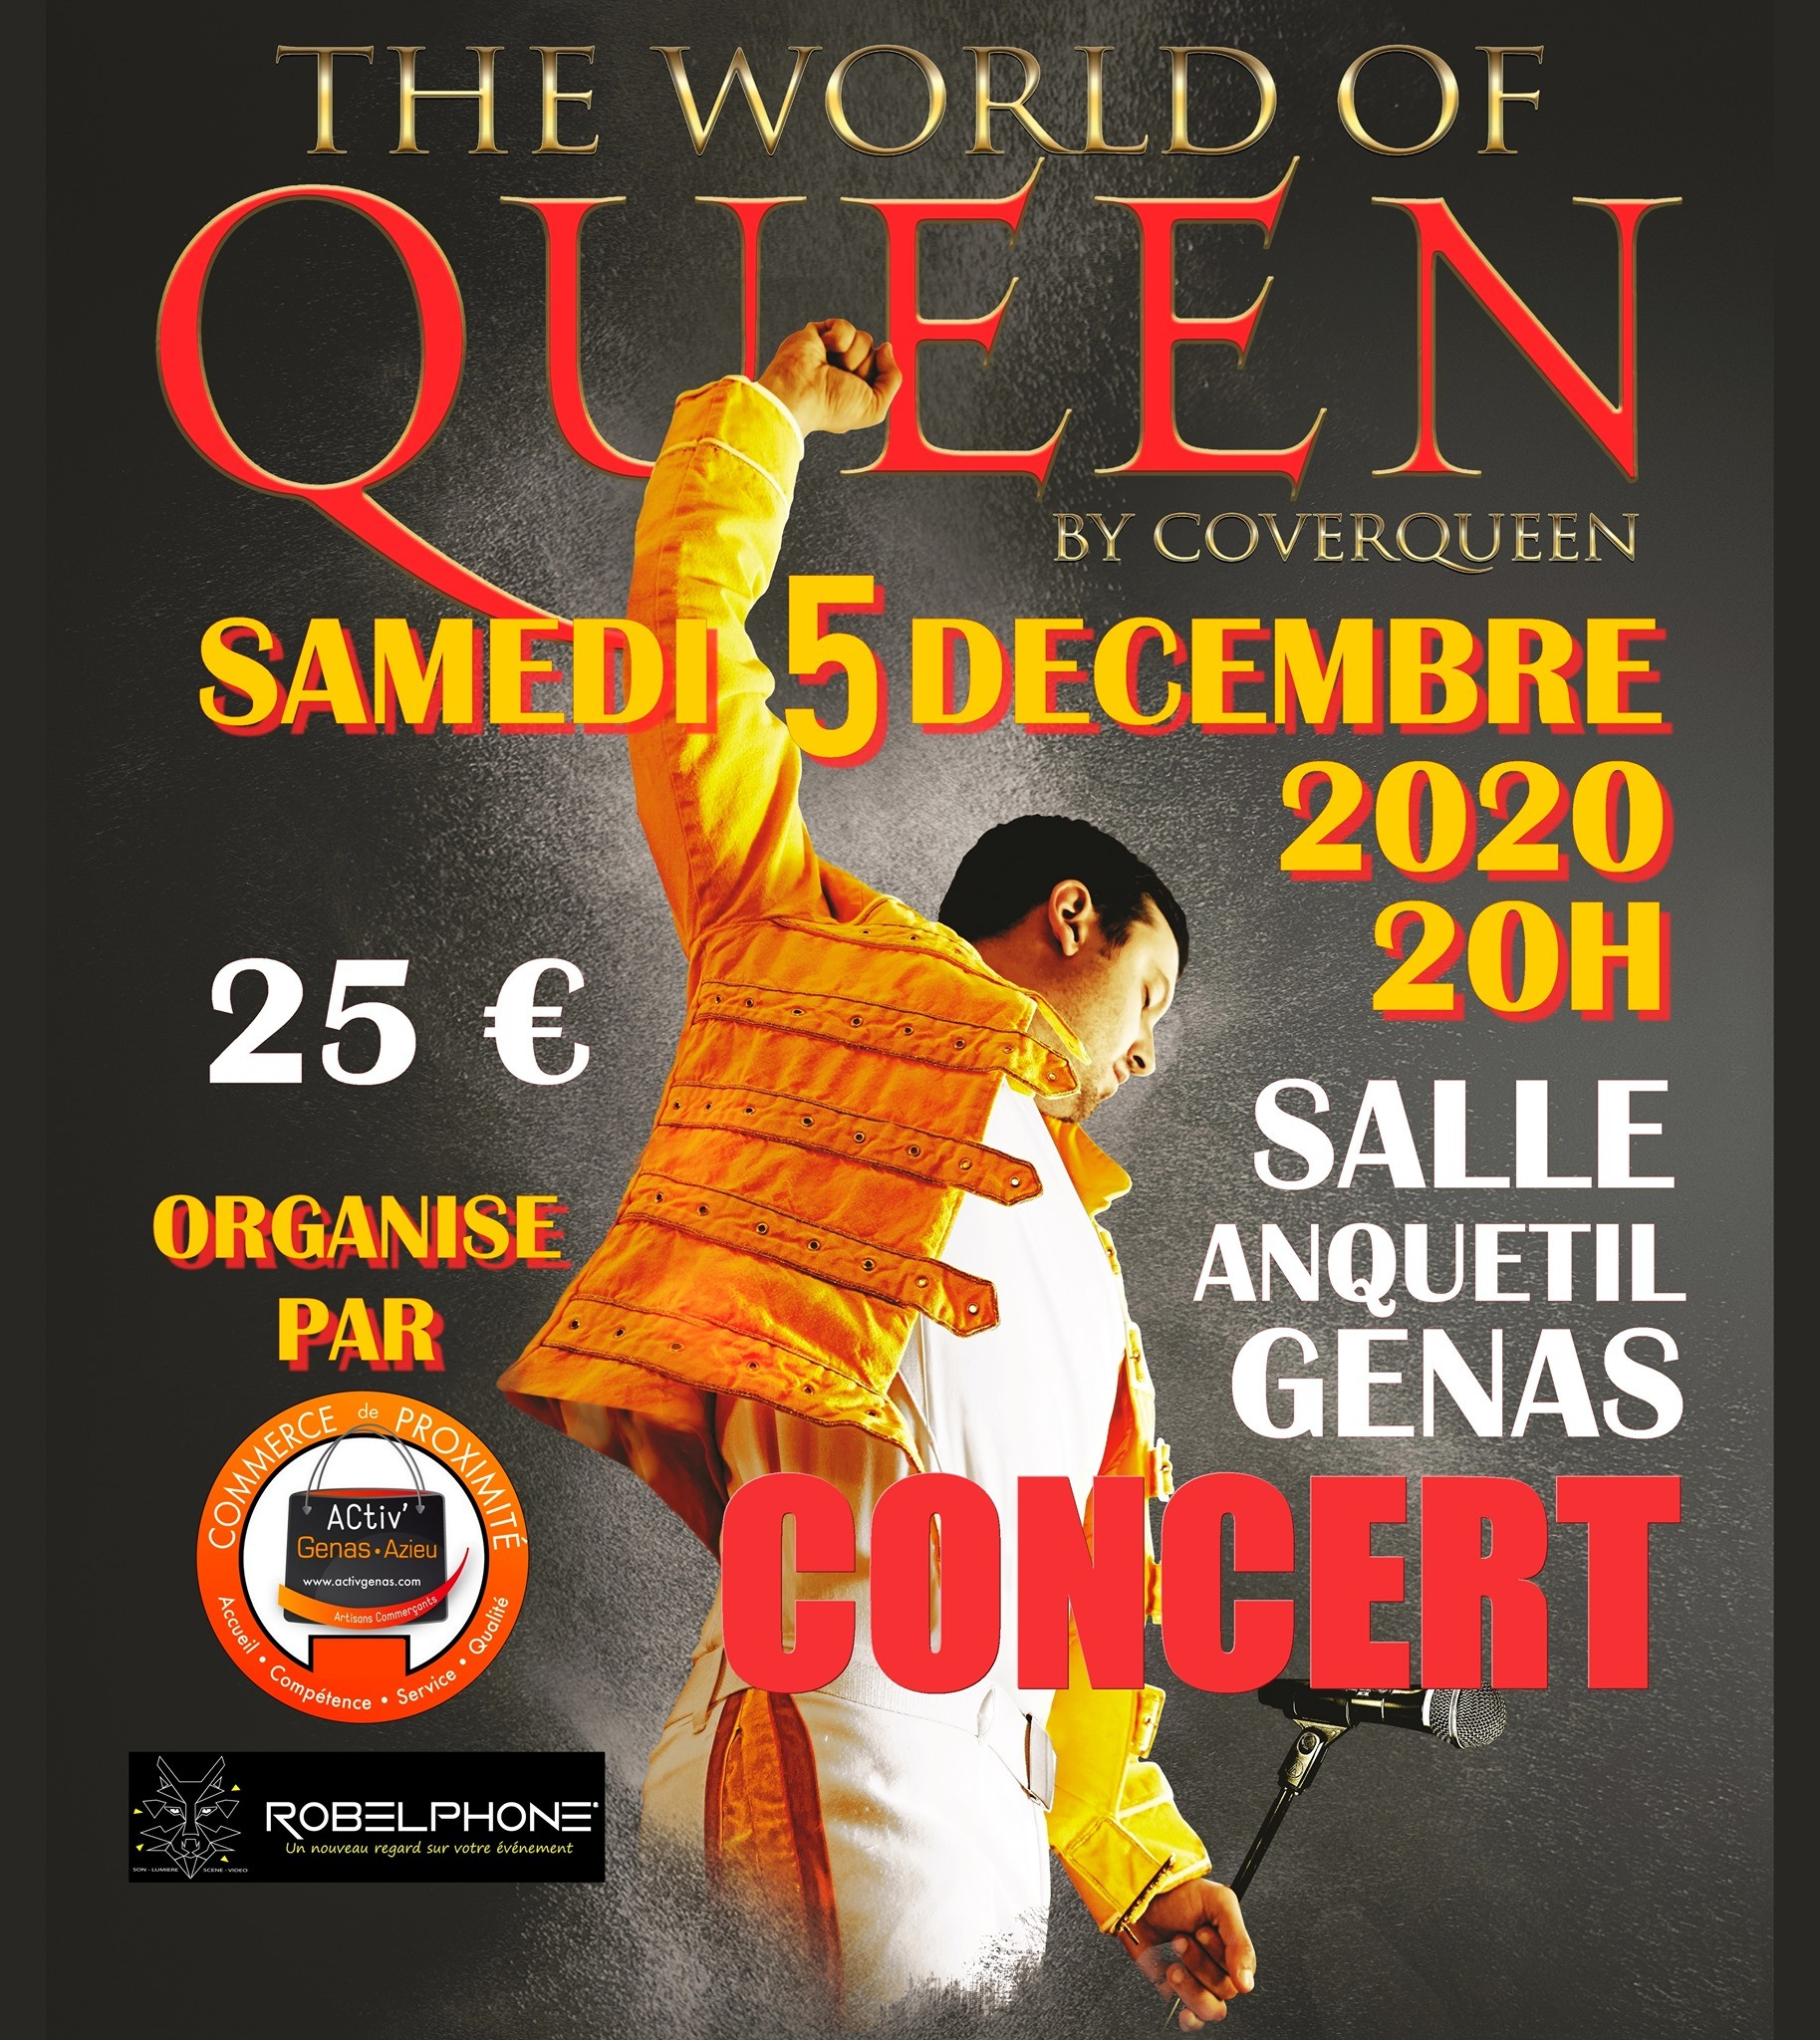 L'immobilier OFF - Concert CoverQueen Activ Genas 2020